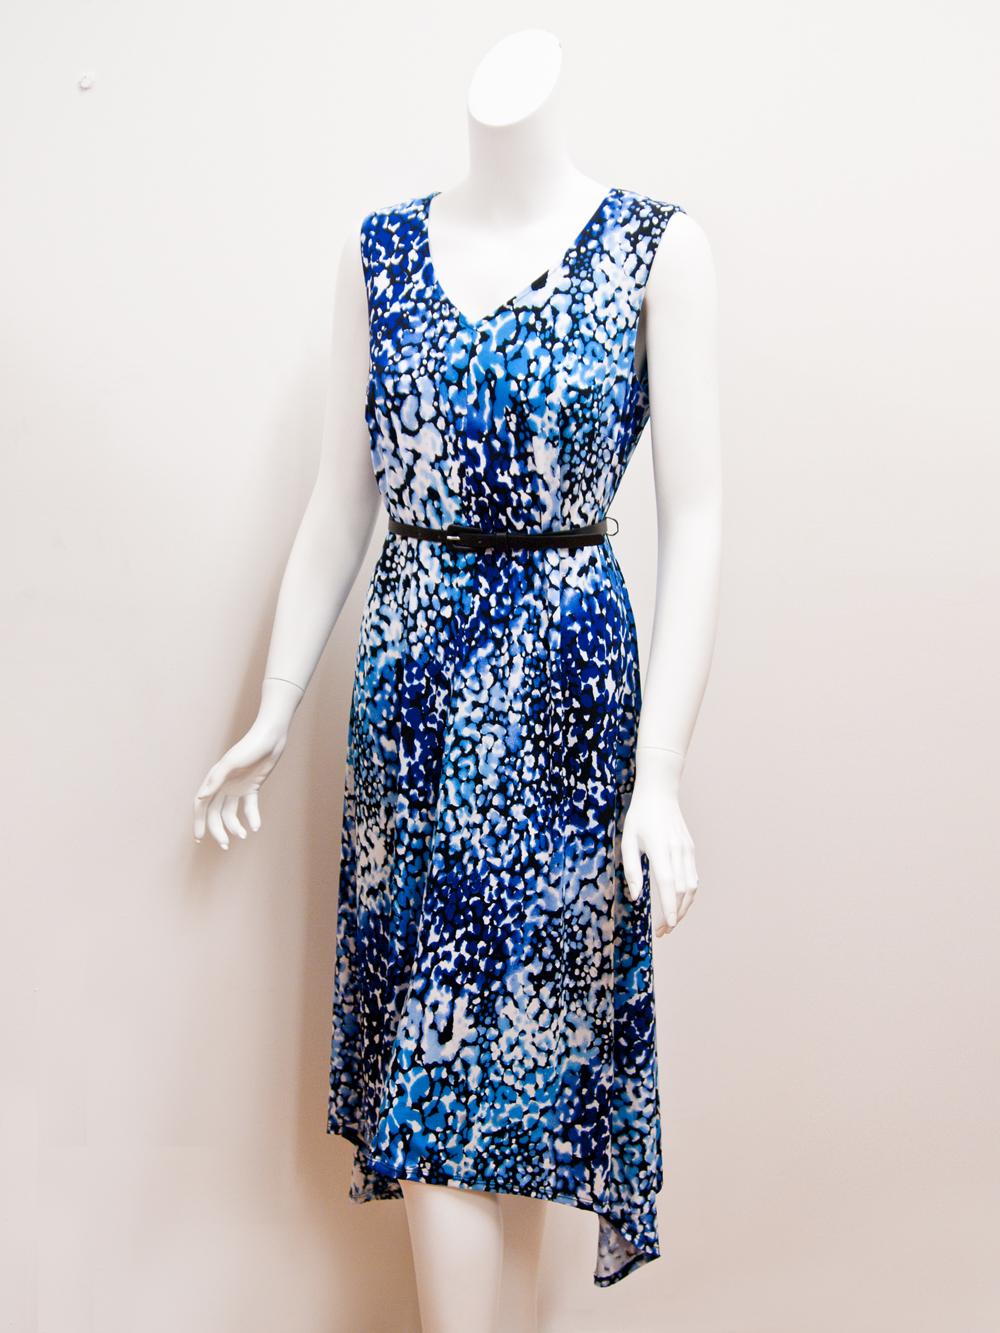 styleciti-dress-TT style-02